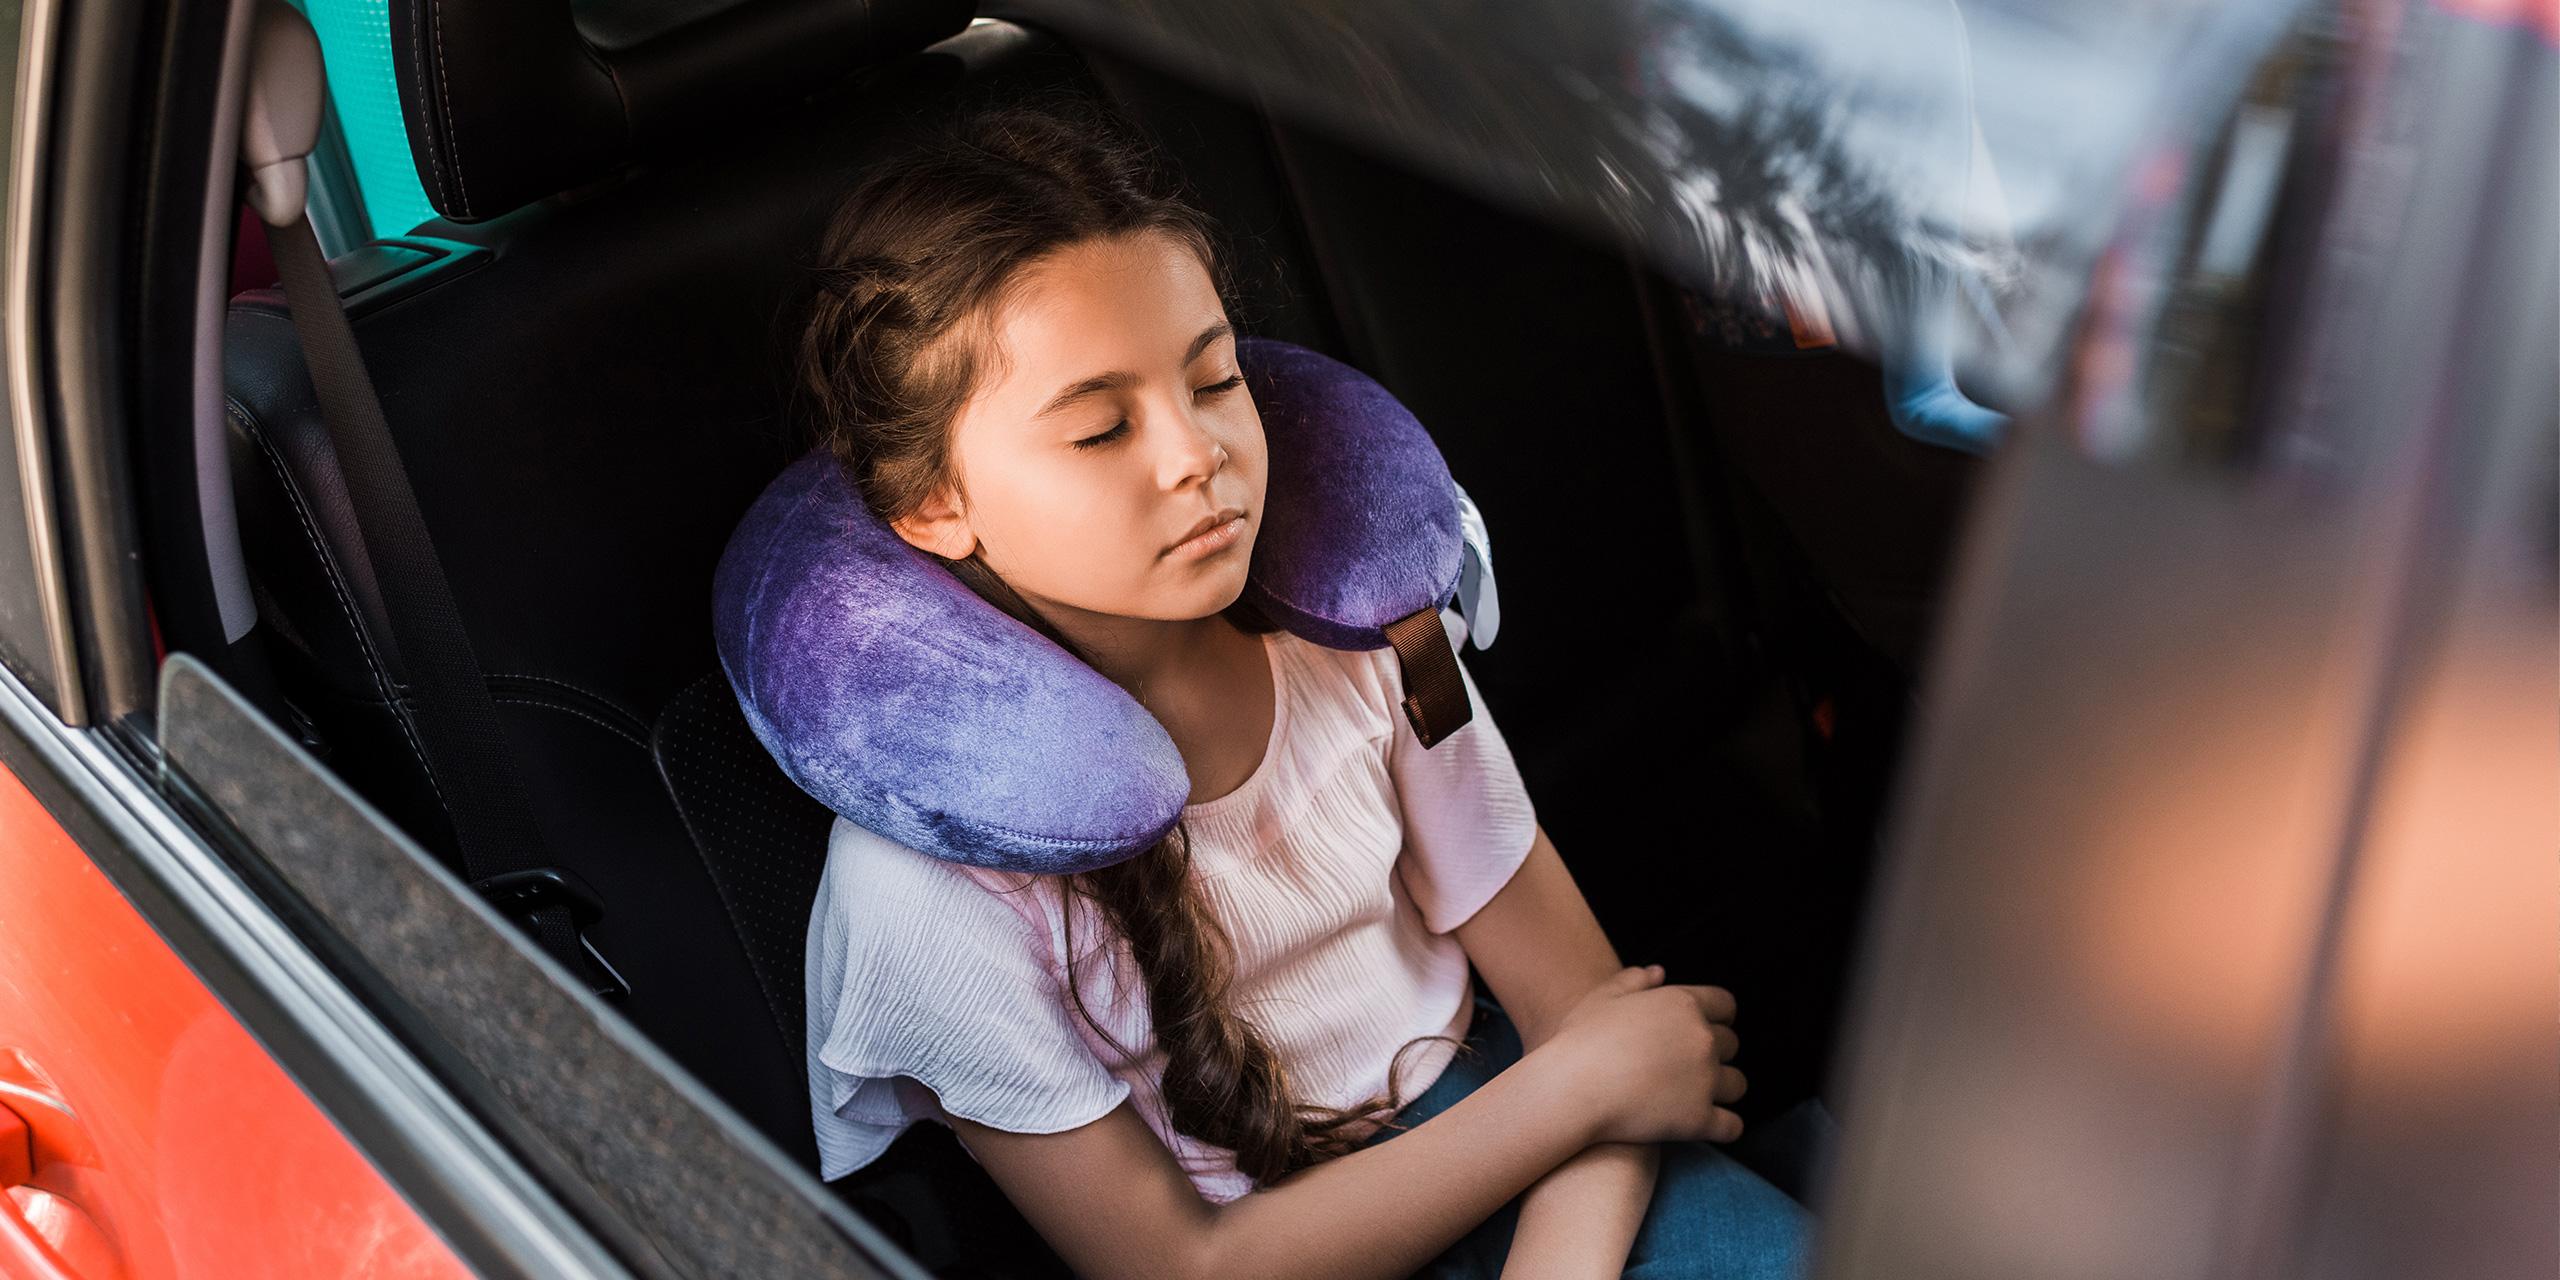 kid sleeping in car with neck pillow; Courtesy of LightField Studios/Shutterstock